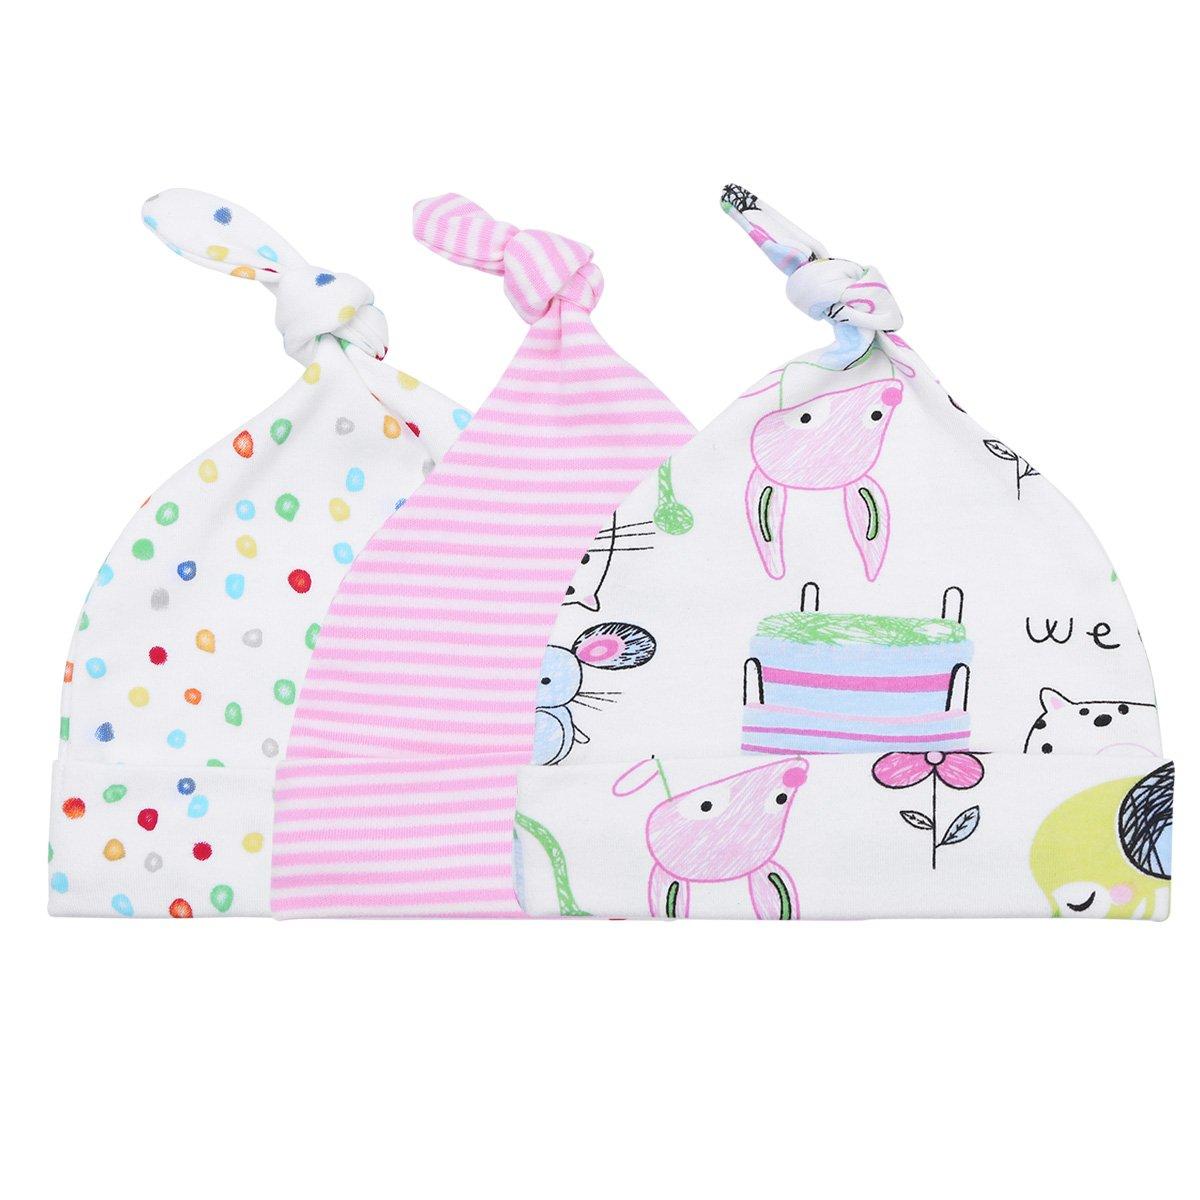 8f2cdef0e2d TiaoBug Unisex Newborn Infant Baby Boys Girls Hats Soft 100% Organic Cotton  Beanie Hospital Caps